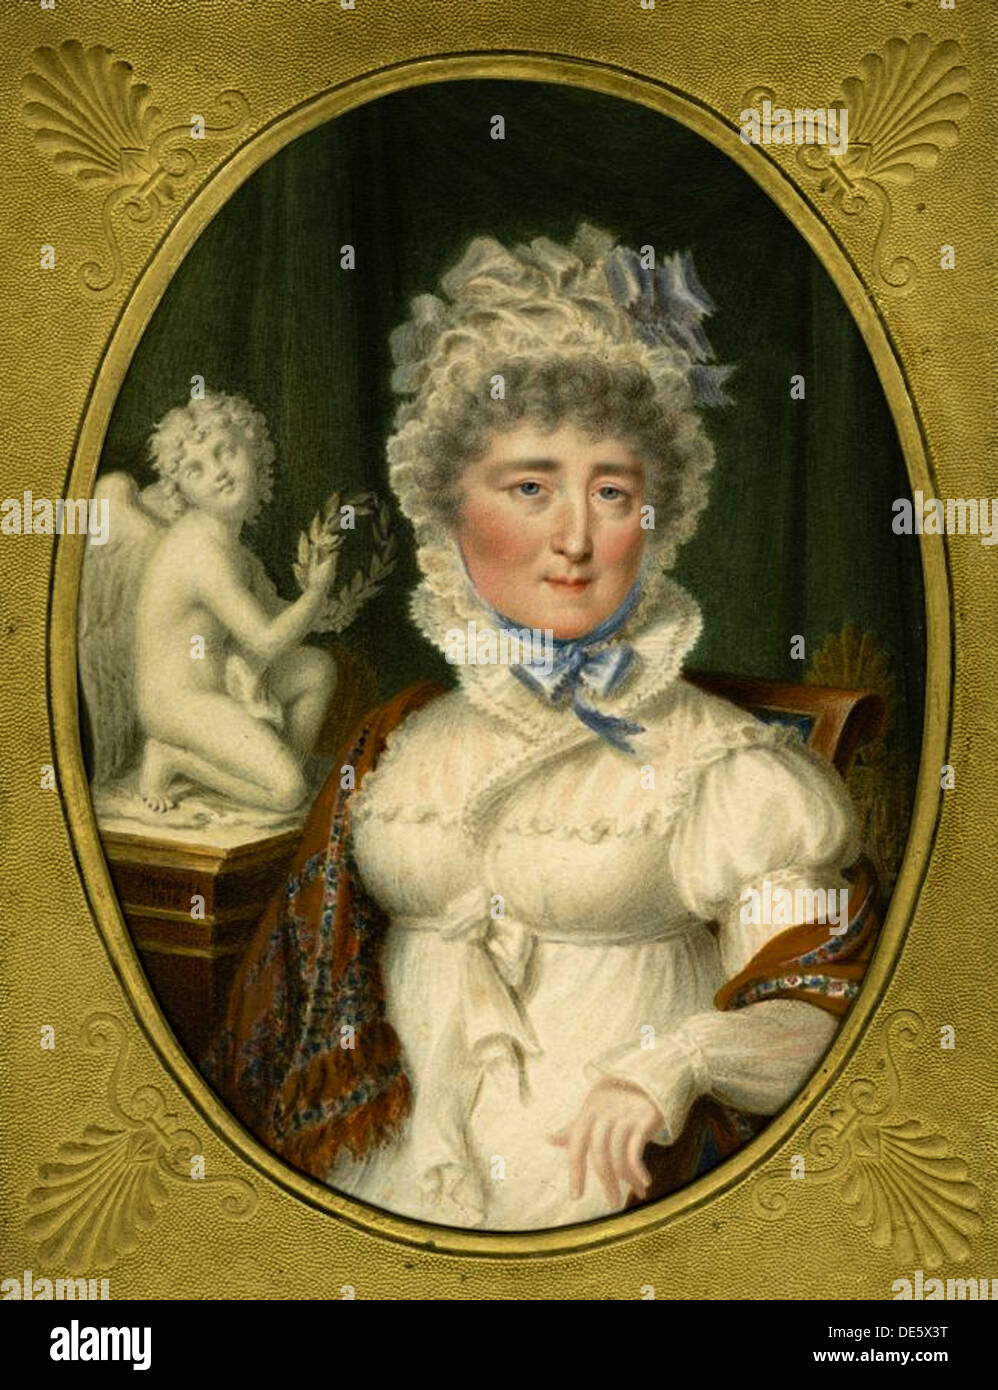 Portrait of Princess Elzbieta Izabela Lubomirska (née Countess Czartoryska) (1736-1816), 1816. Artist: Hummel, Carl (1769-1840) - Stock Image